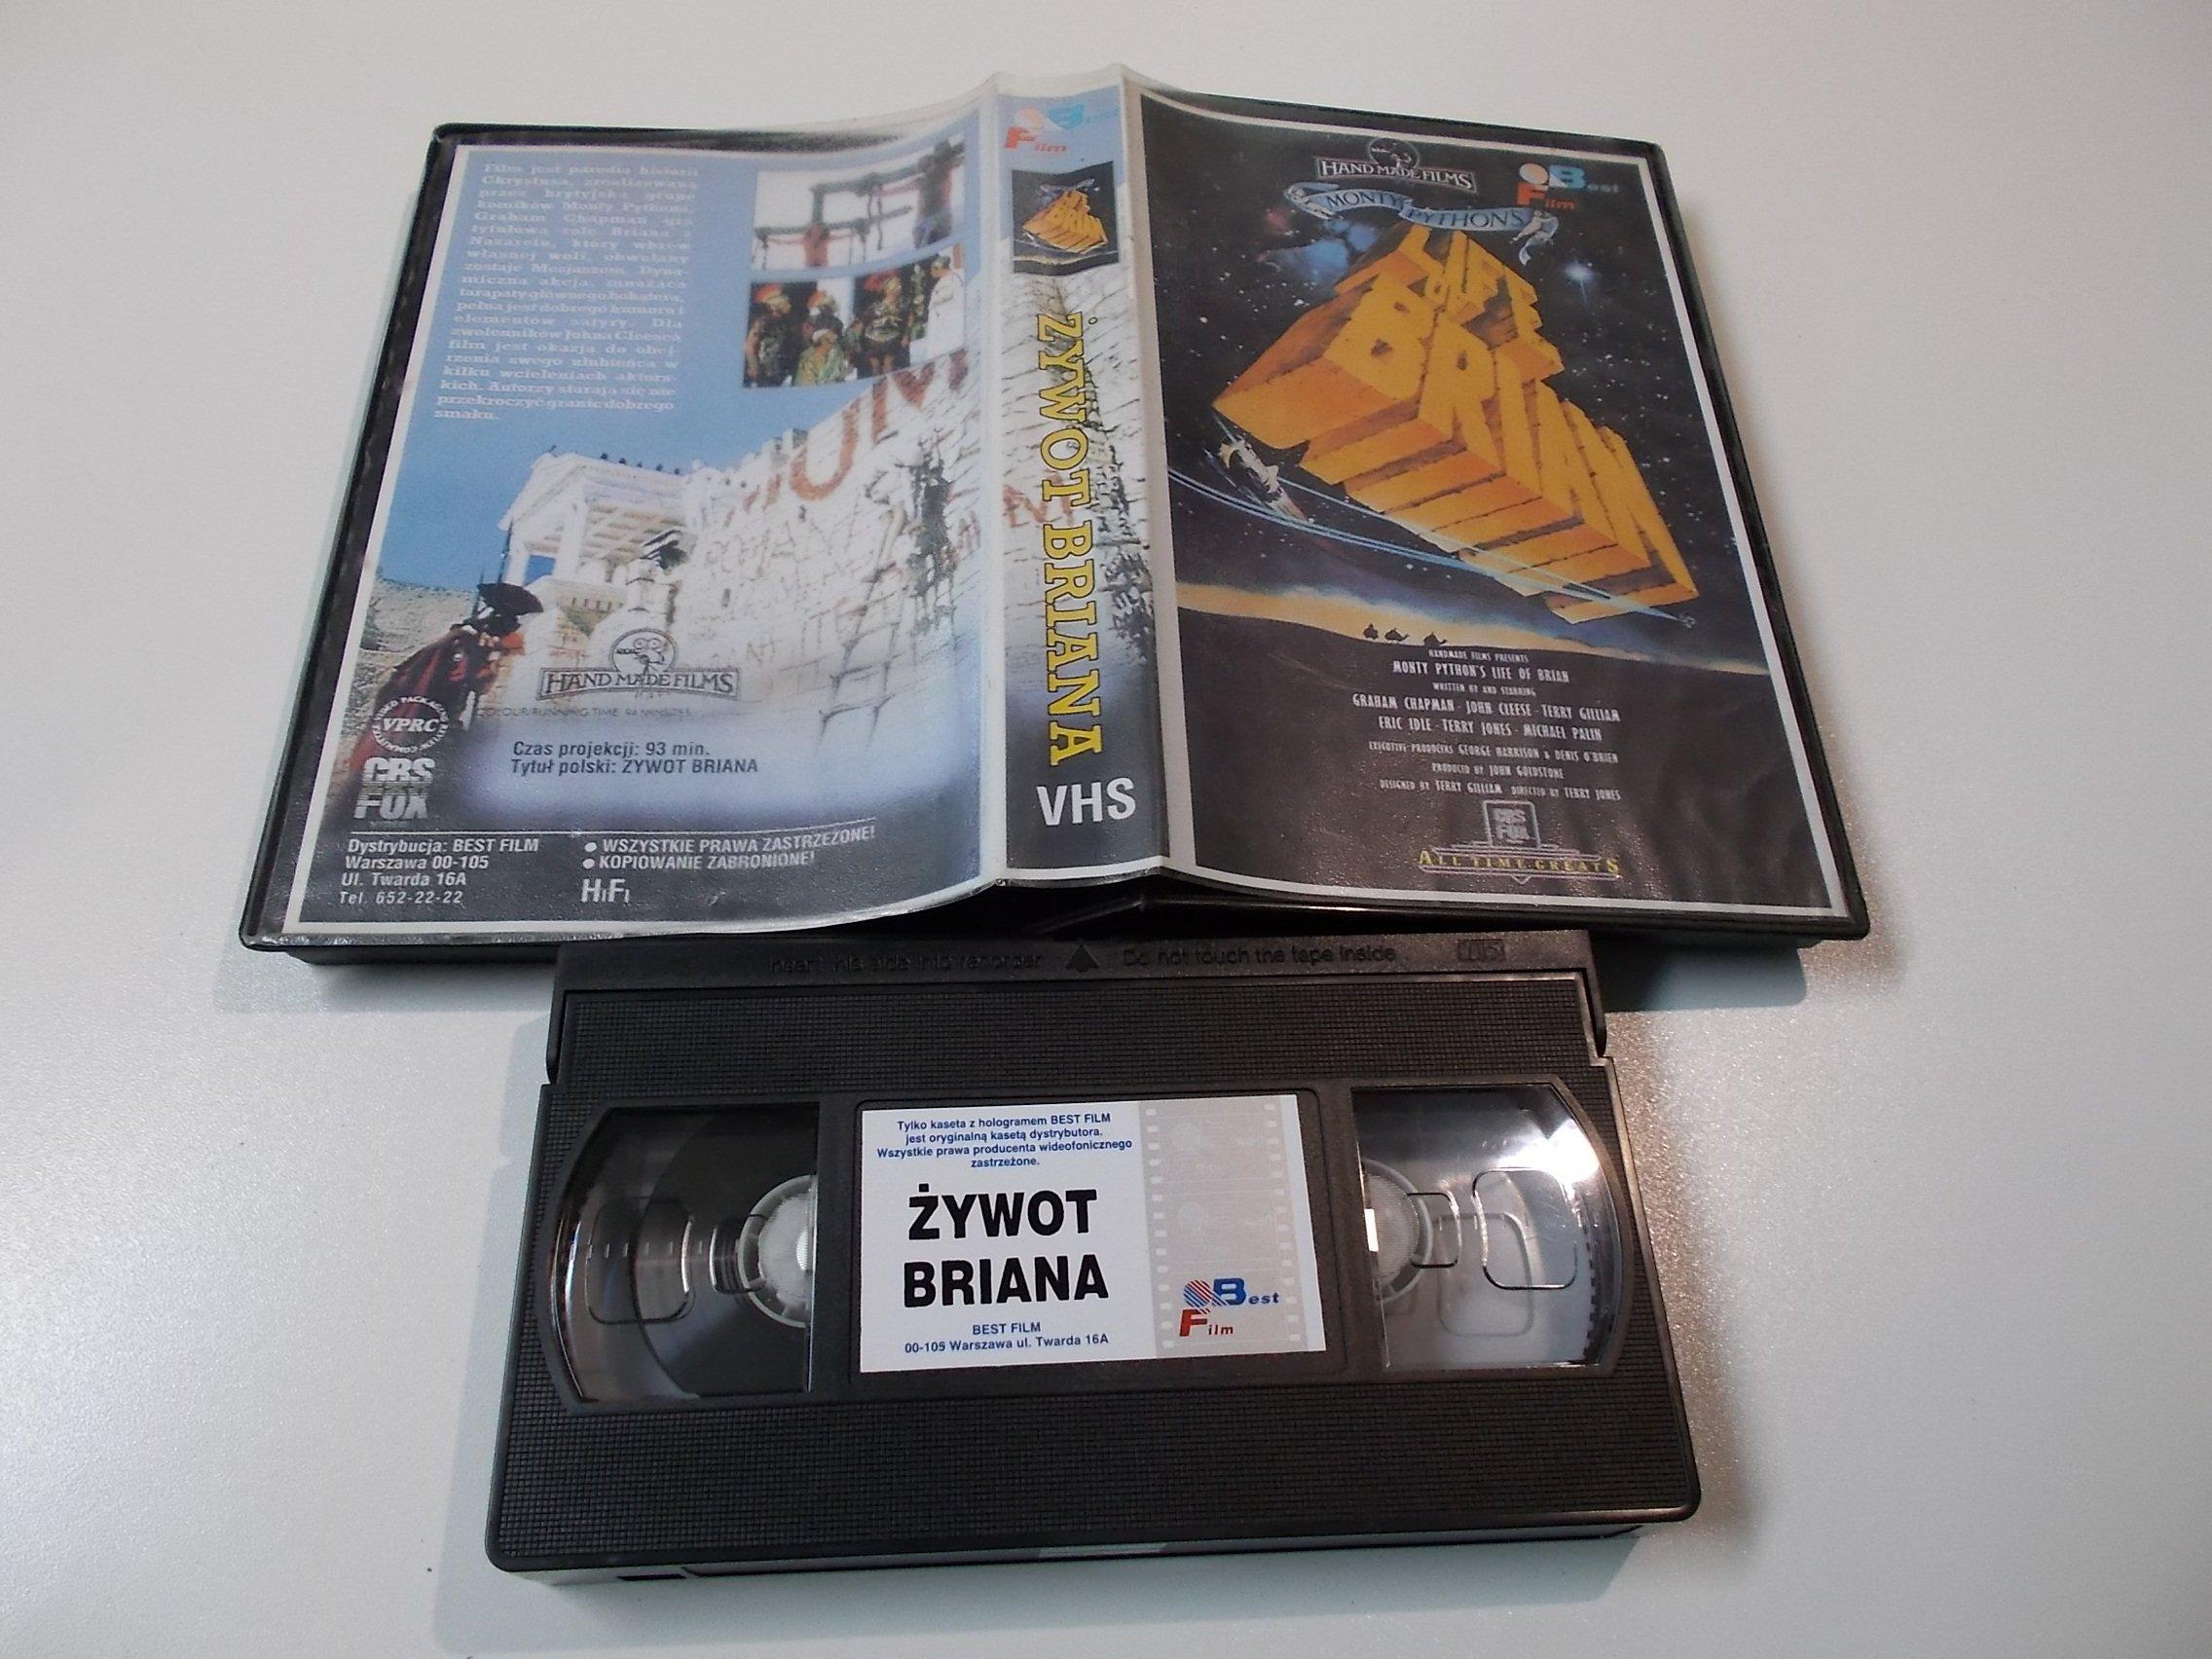 ŻYWOT BRIANA - Kaseta Video VHS - 1478 Opole - AlleOpole.pl